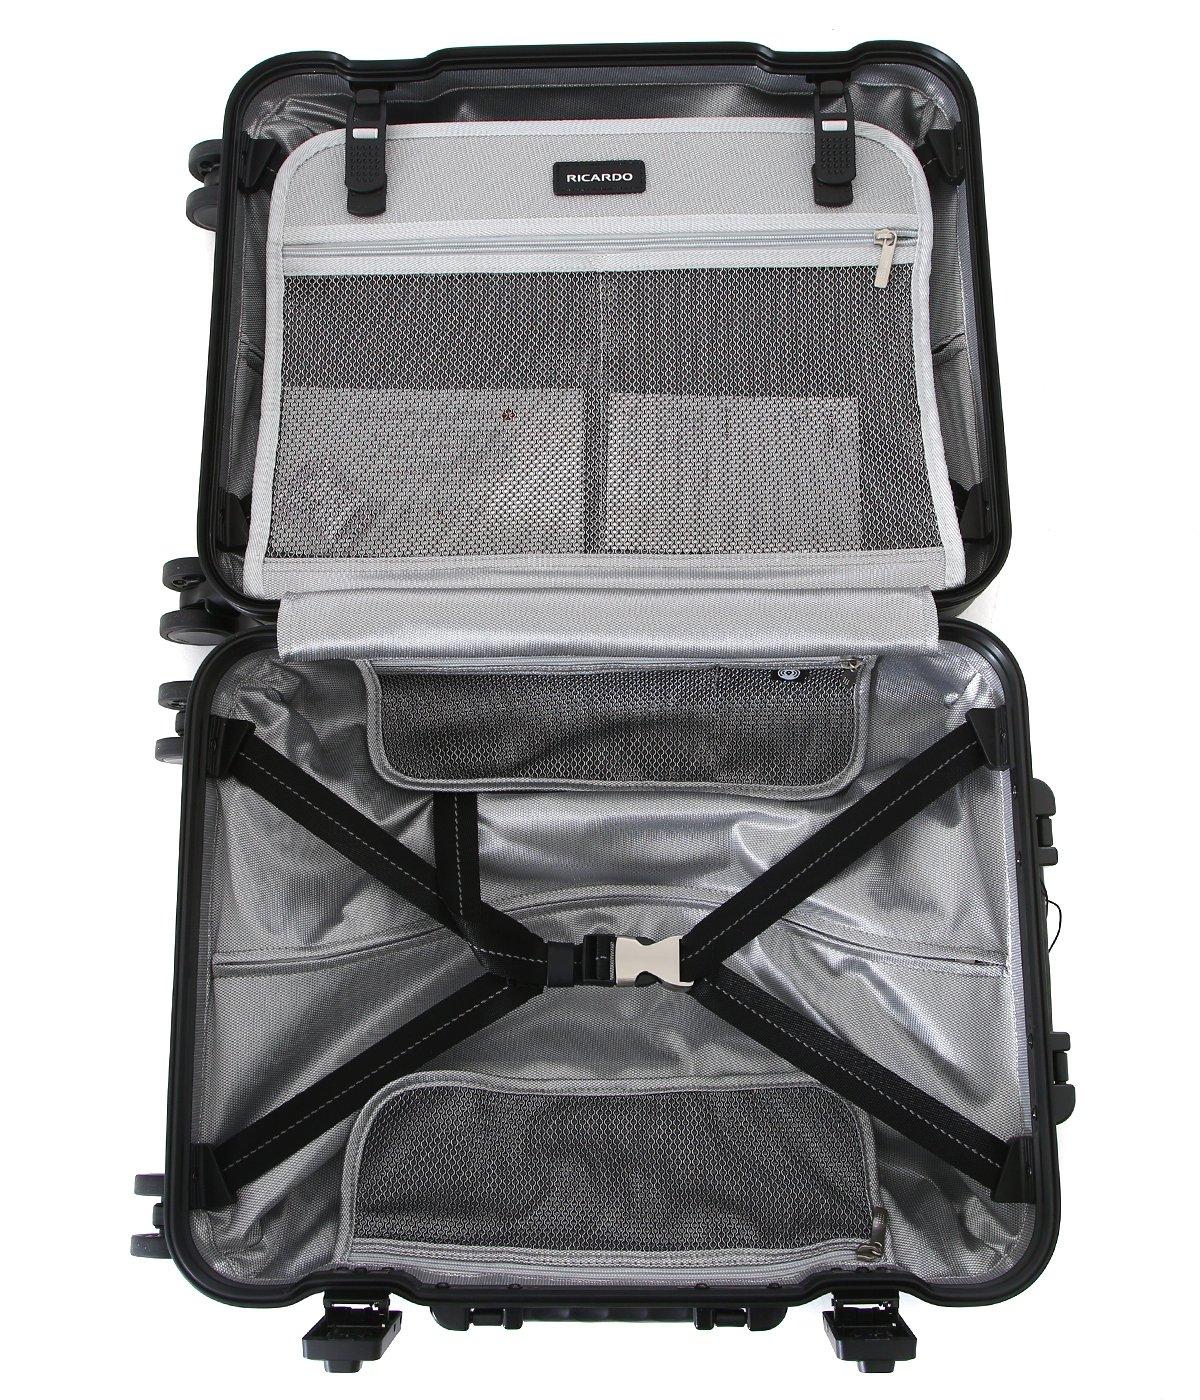 Aileron Vault 19-inch INTL Carry-On